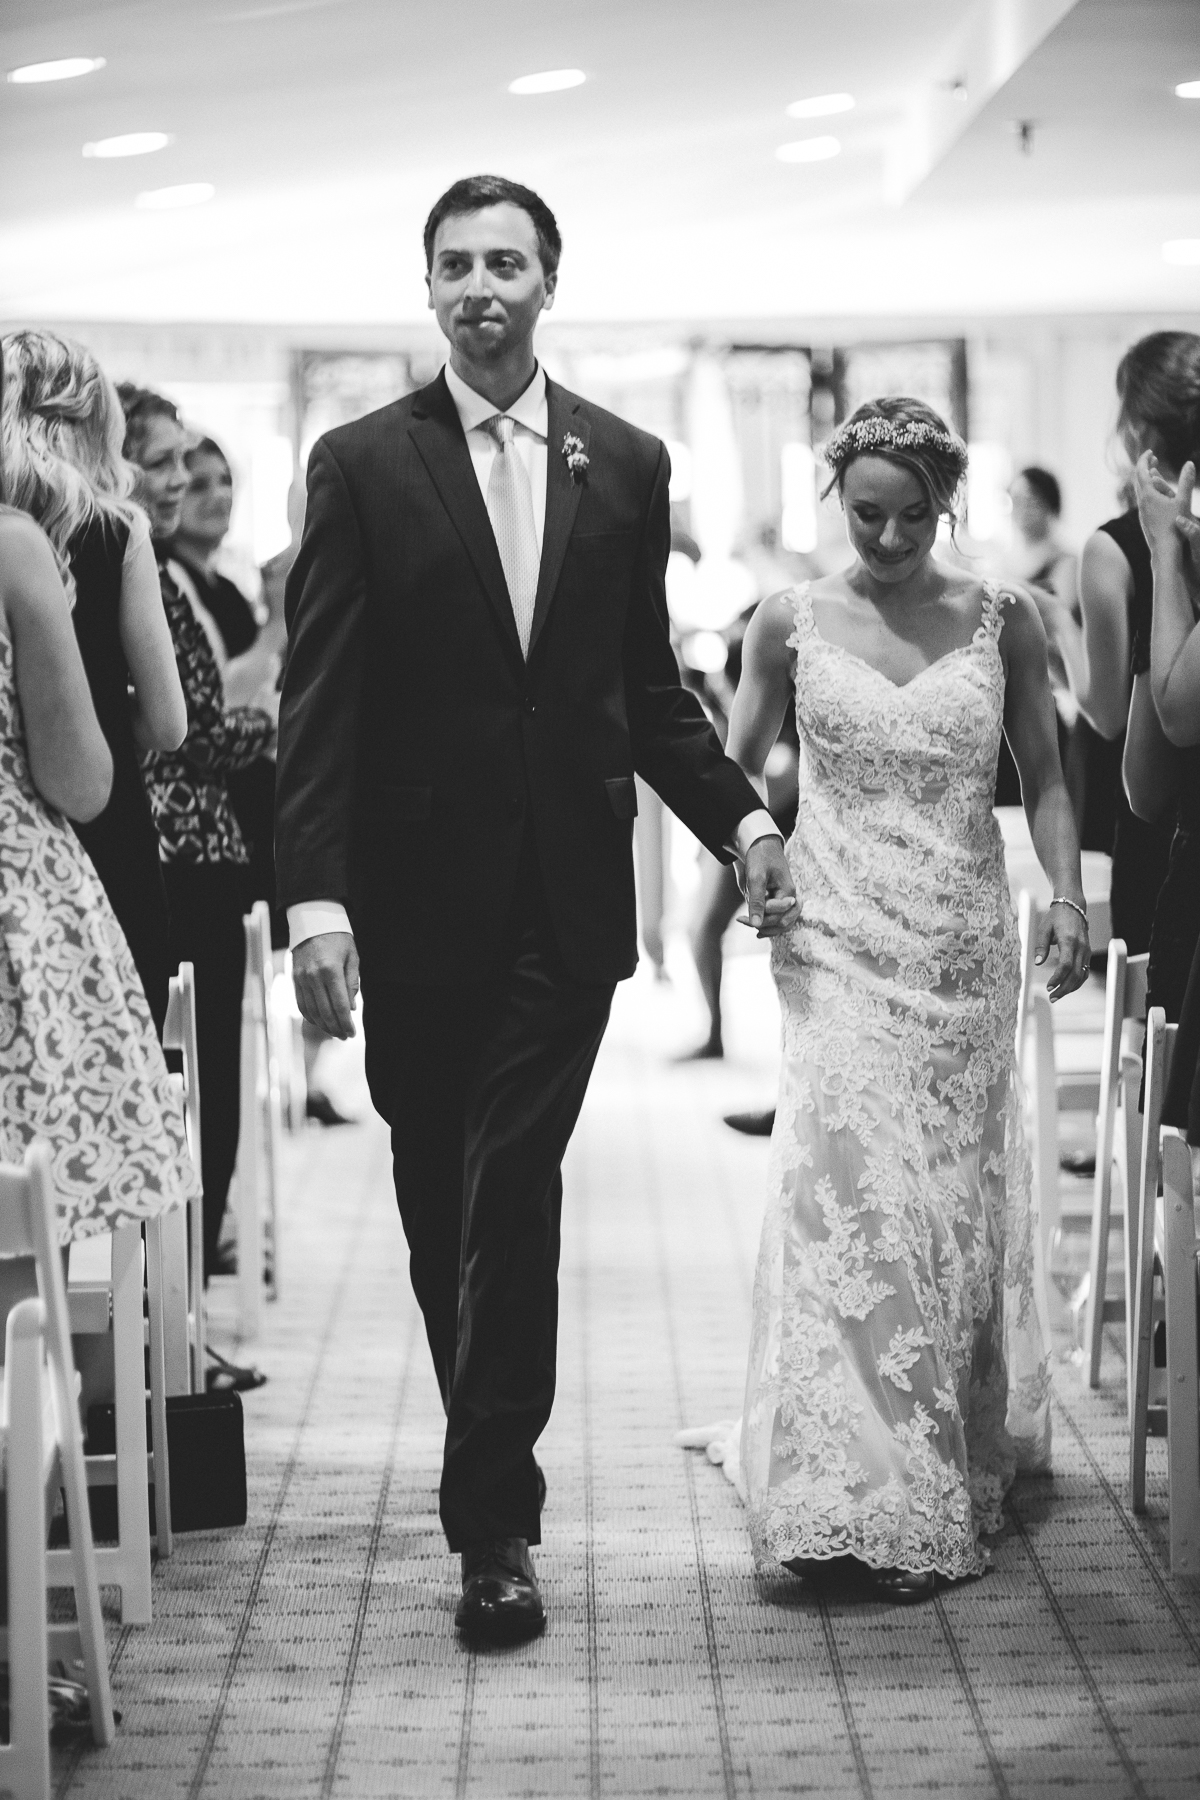 taylor-travis-grandfather-mountain-kelley-raye-north-carolina-wedding-photographer-83.jpg